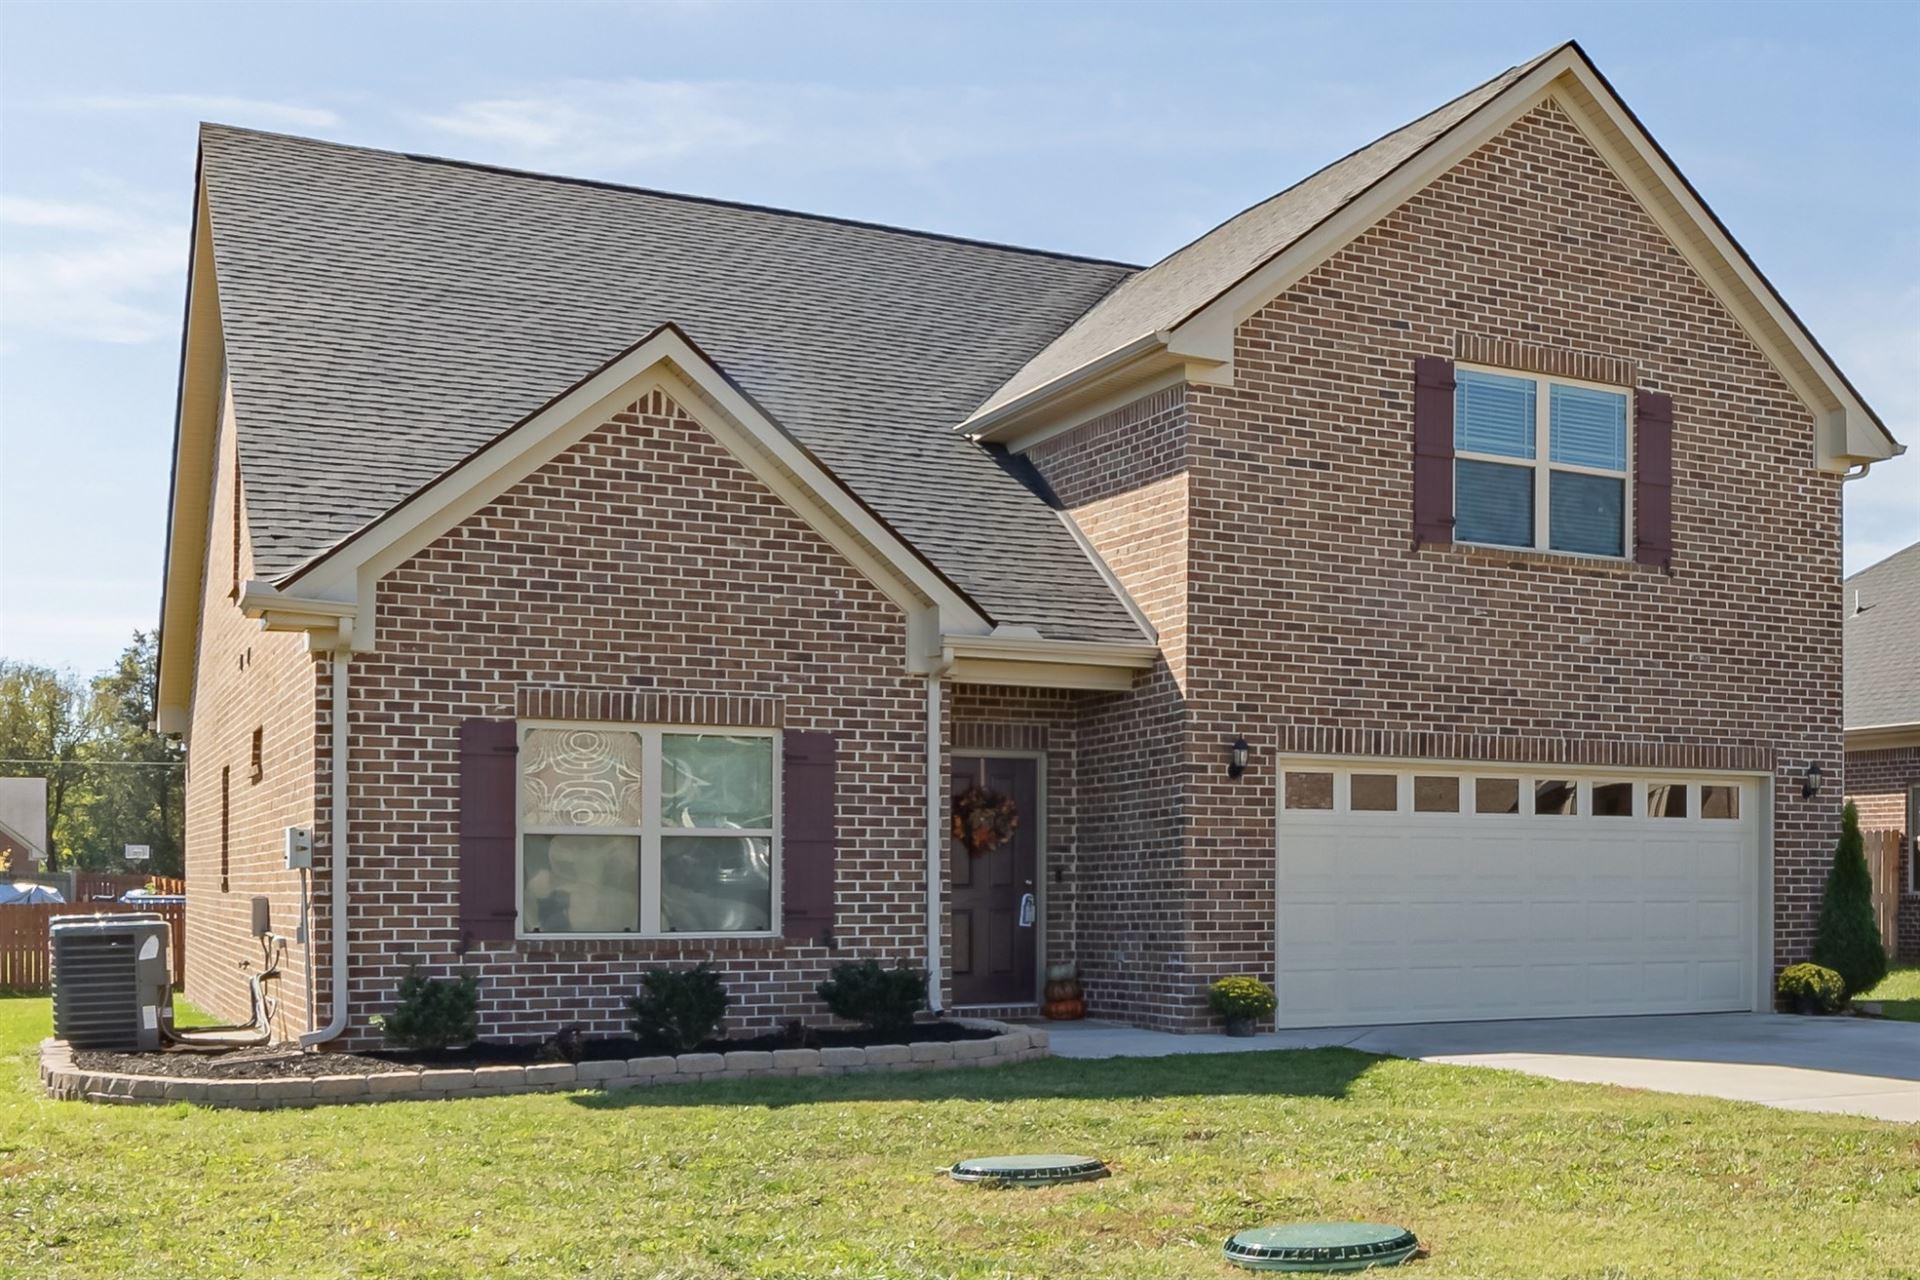 1015 Selous Dr, Murfreesboro, TN 37128 - MLS#: 2301428